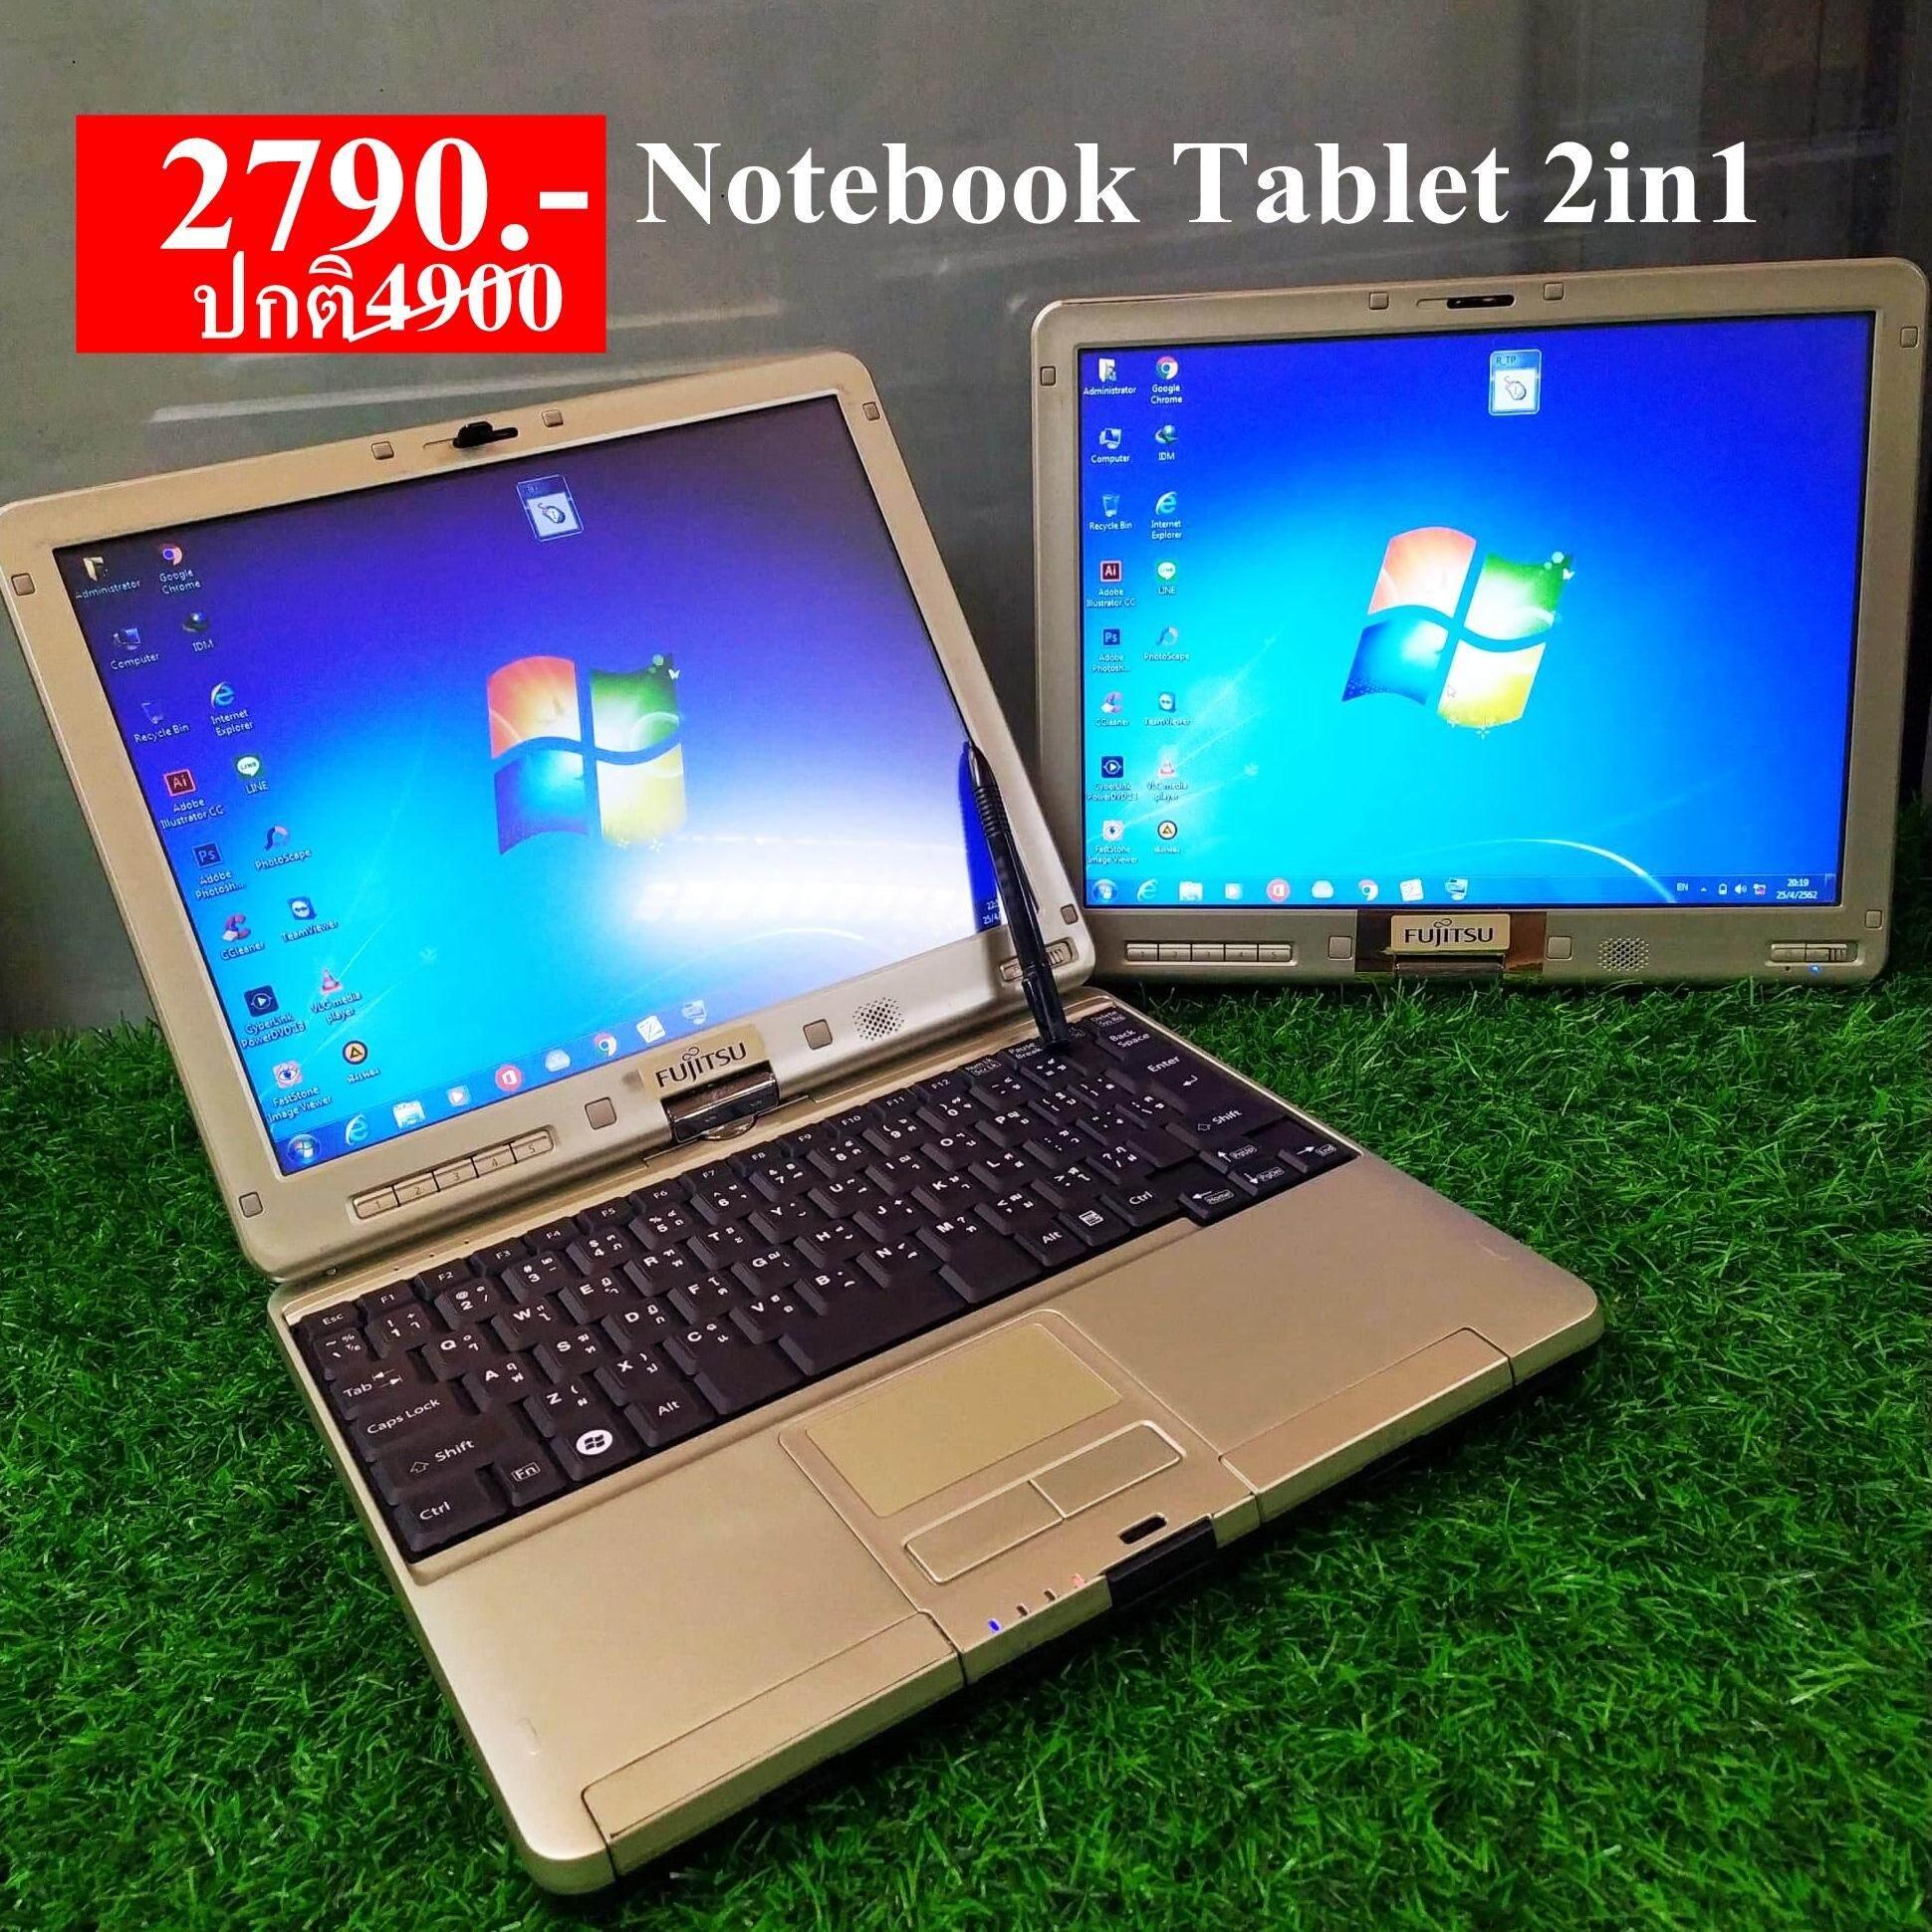 Netbook Tablet Fujitsu Tl1 จอทัชกรีน หมุนได้ มีปากกา By Racha Computer.